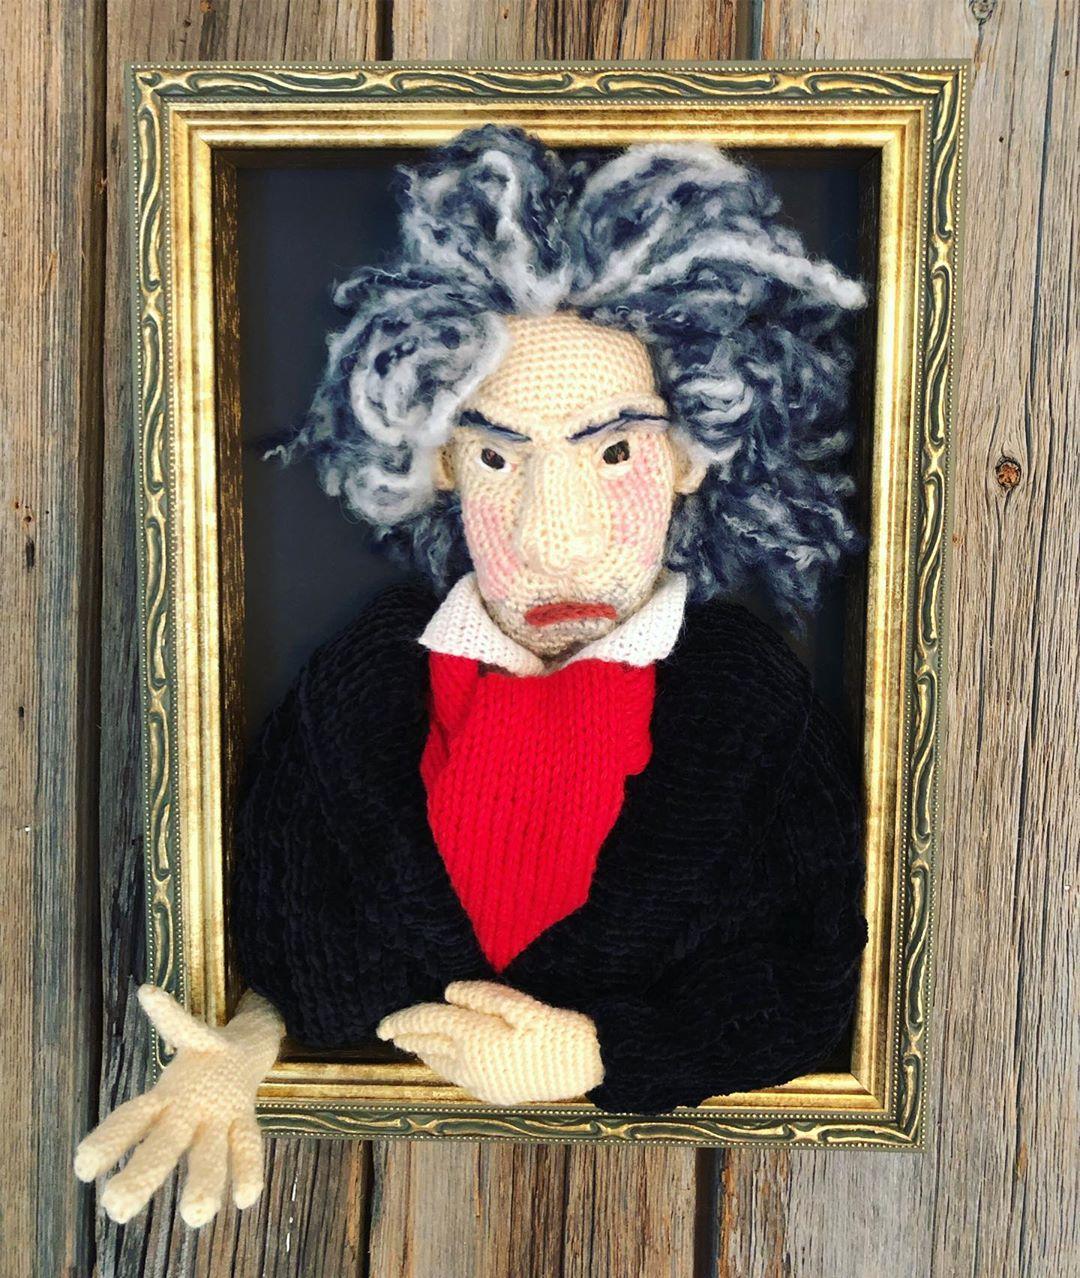 Sekimoto Tomoko's 3D Crochet Portraits of Johannes Brahms & Ludwig van Beethoven